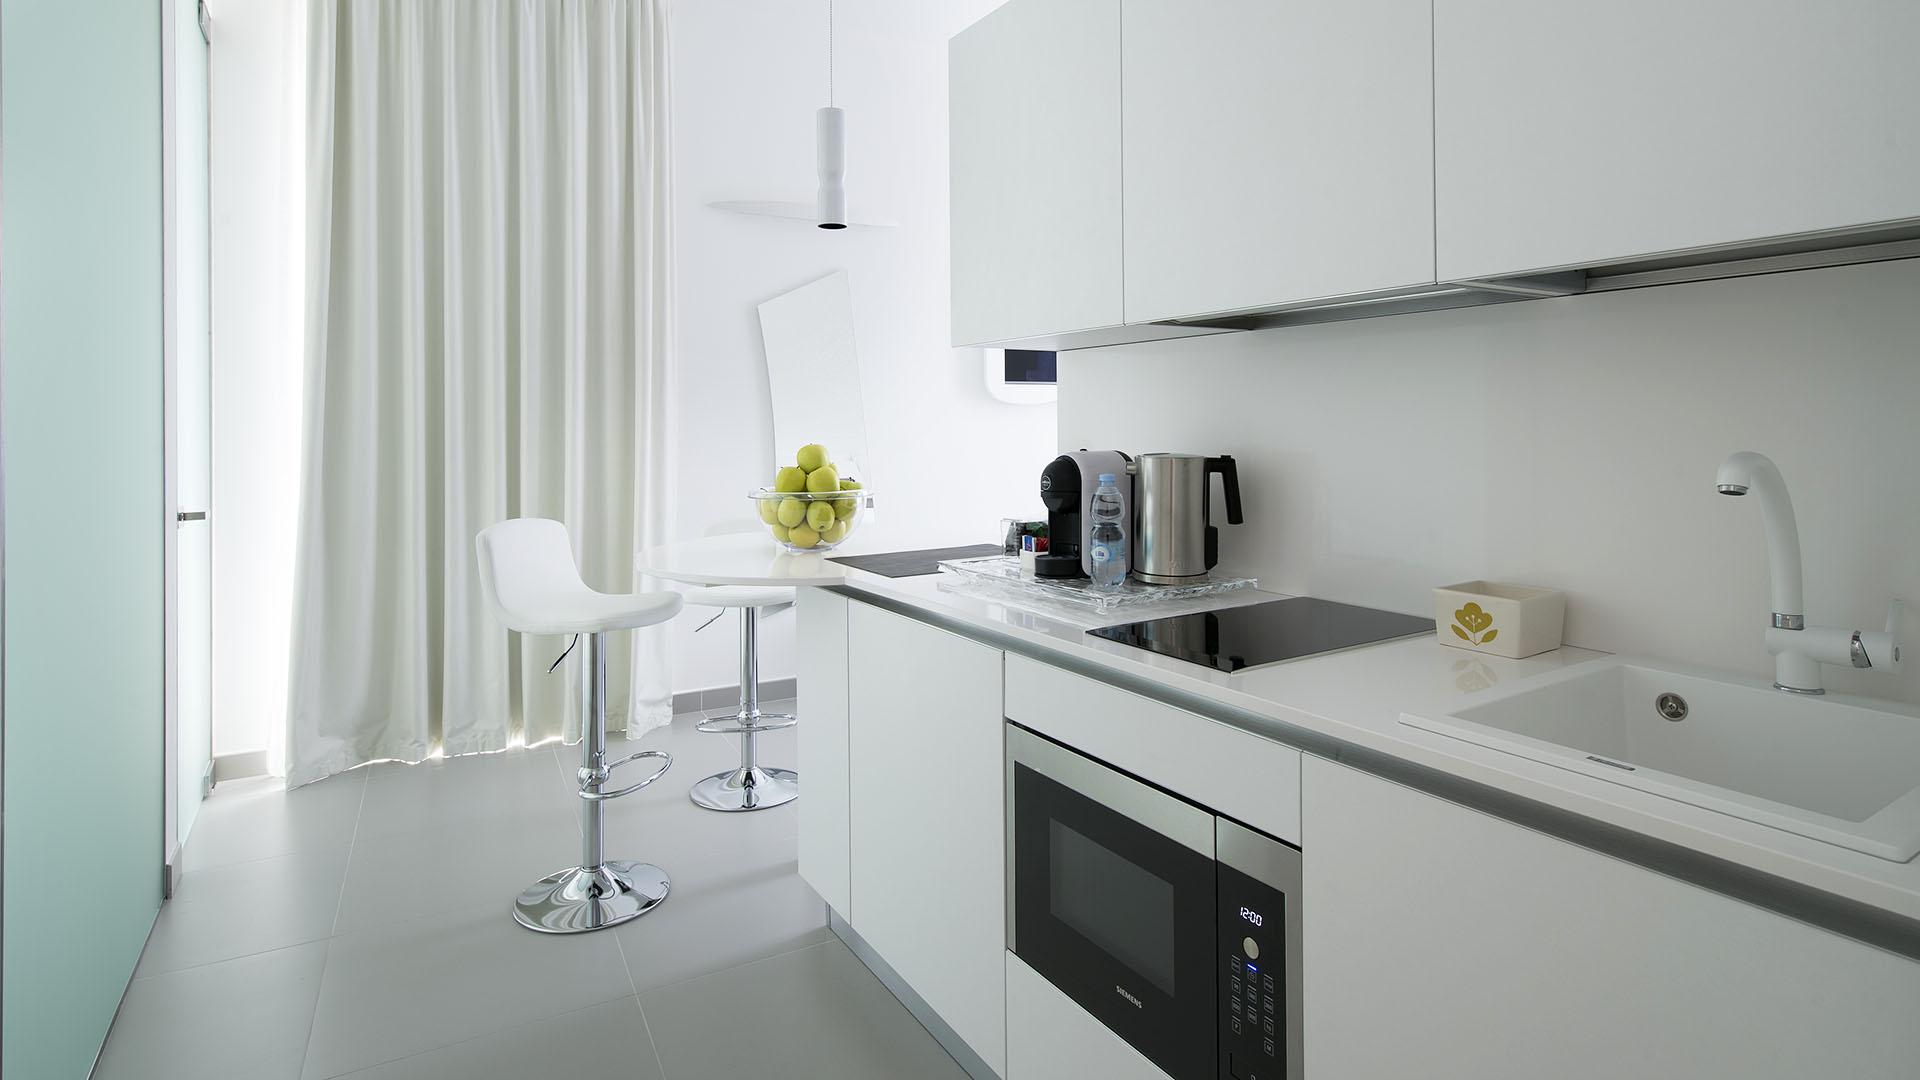 Mia Aparthotel Milano - Appartamento Enjoy - Appartamento Business- Cucina